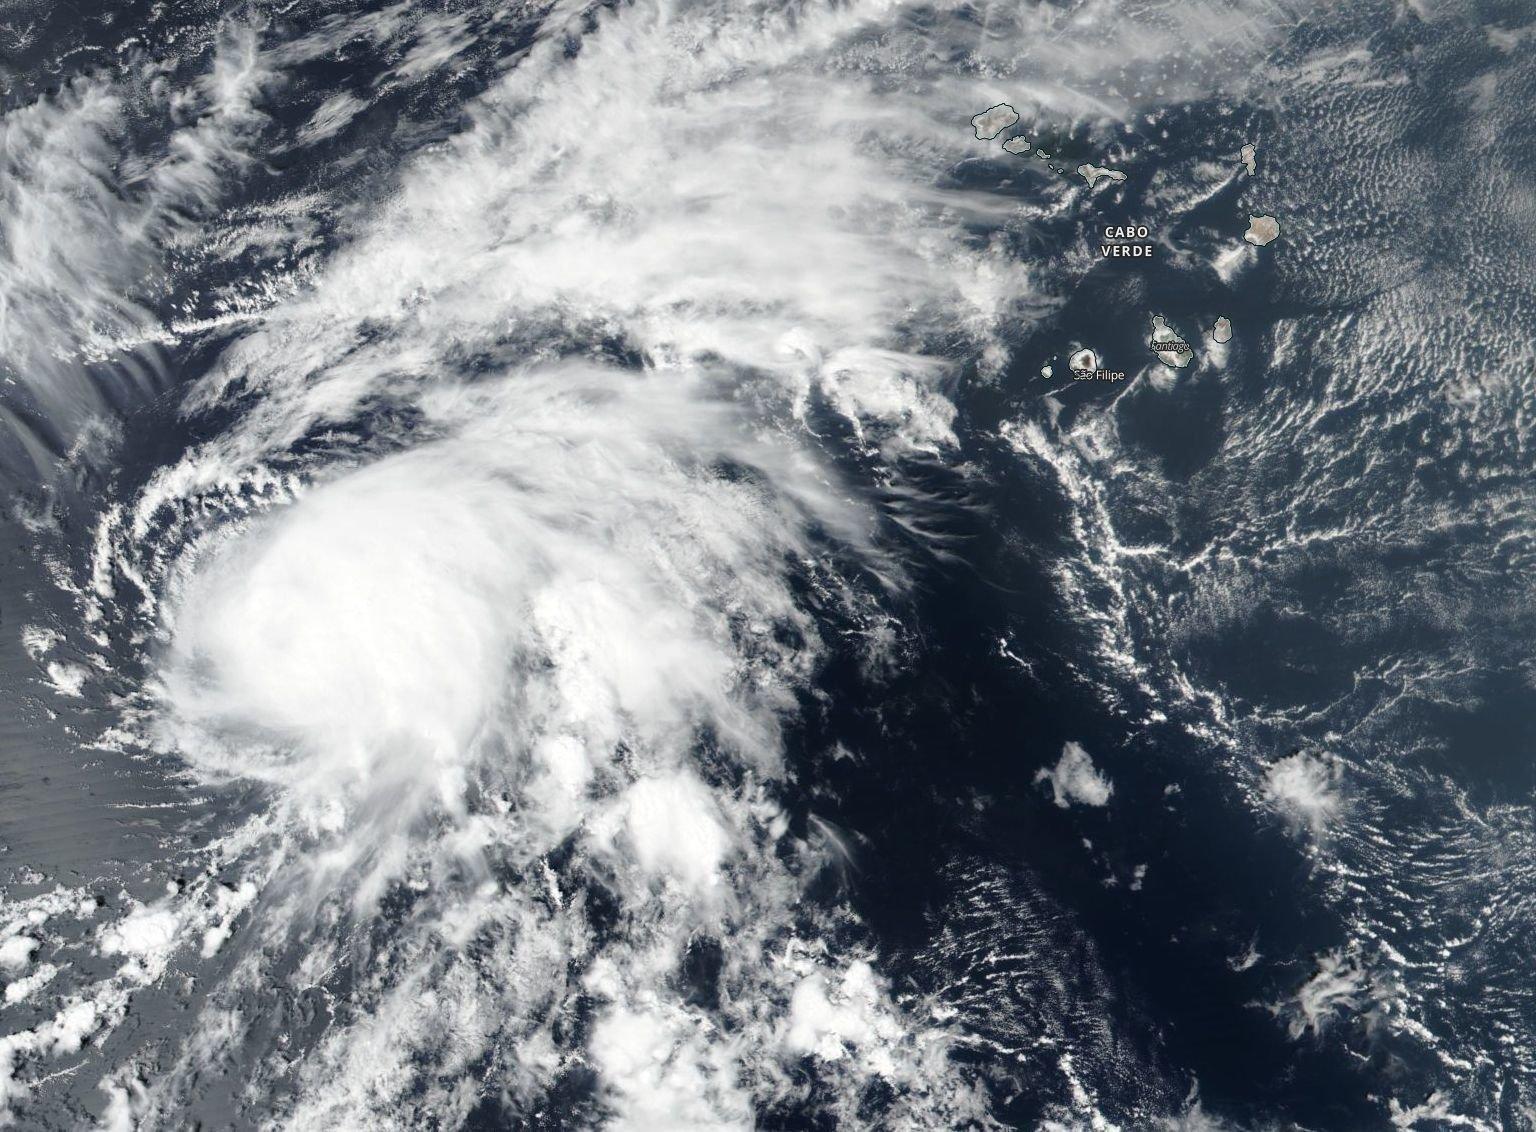 nasa finds wind shear weakening tropical storm nadine